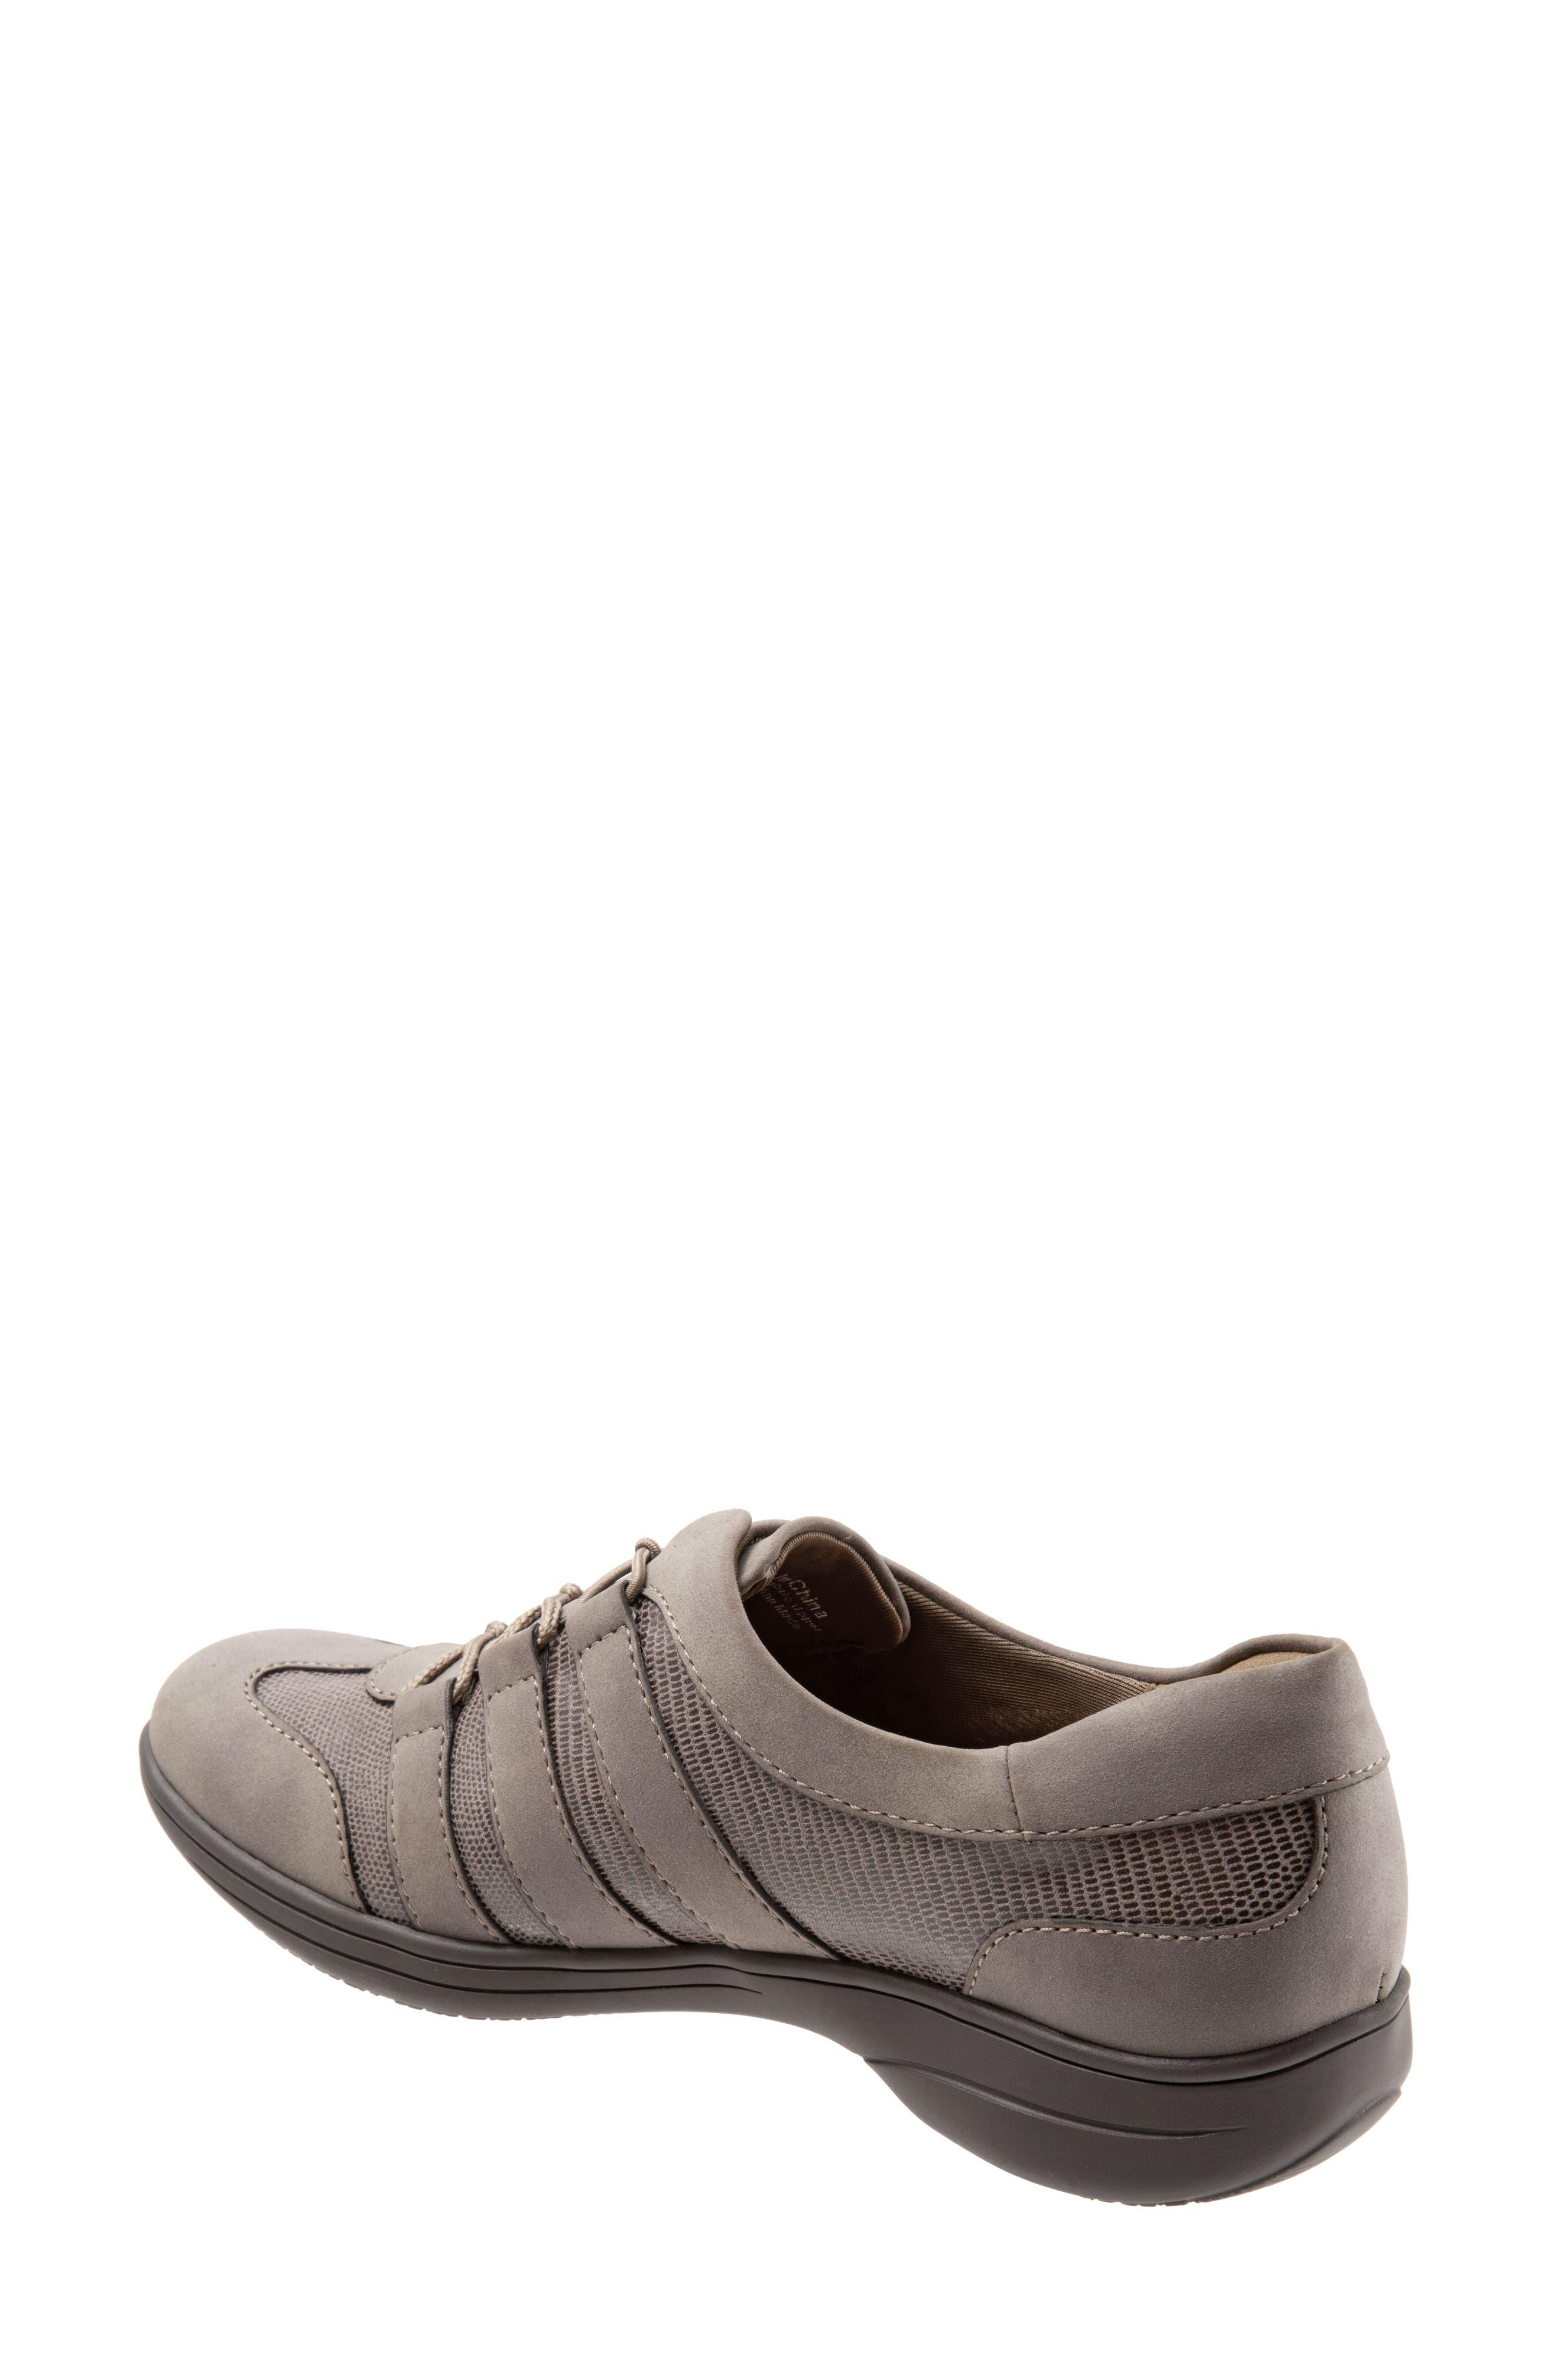 Joy Slip-On Sneaker,                             Alternate thumbnail 2, color,                             TAUPE LEATHER